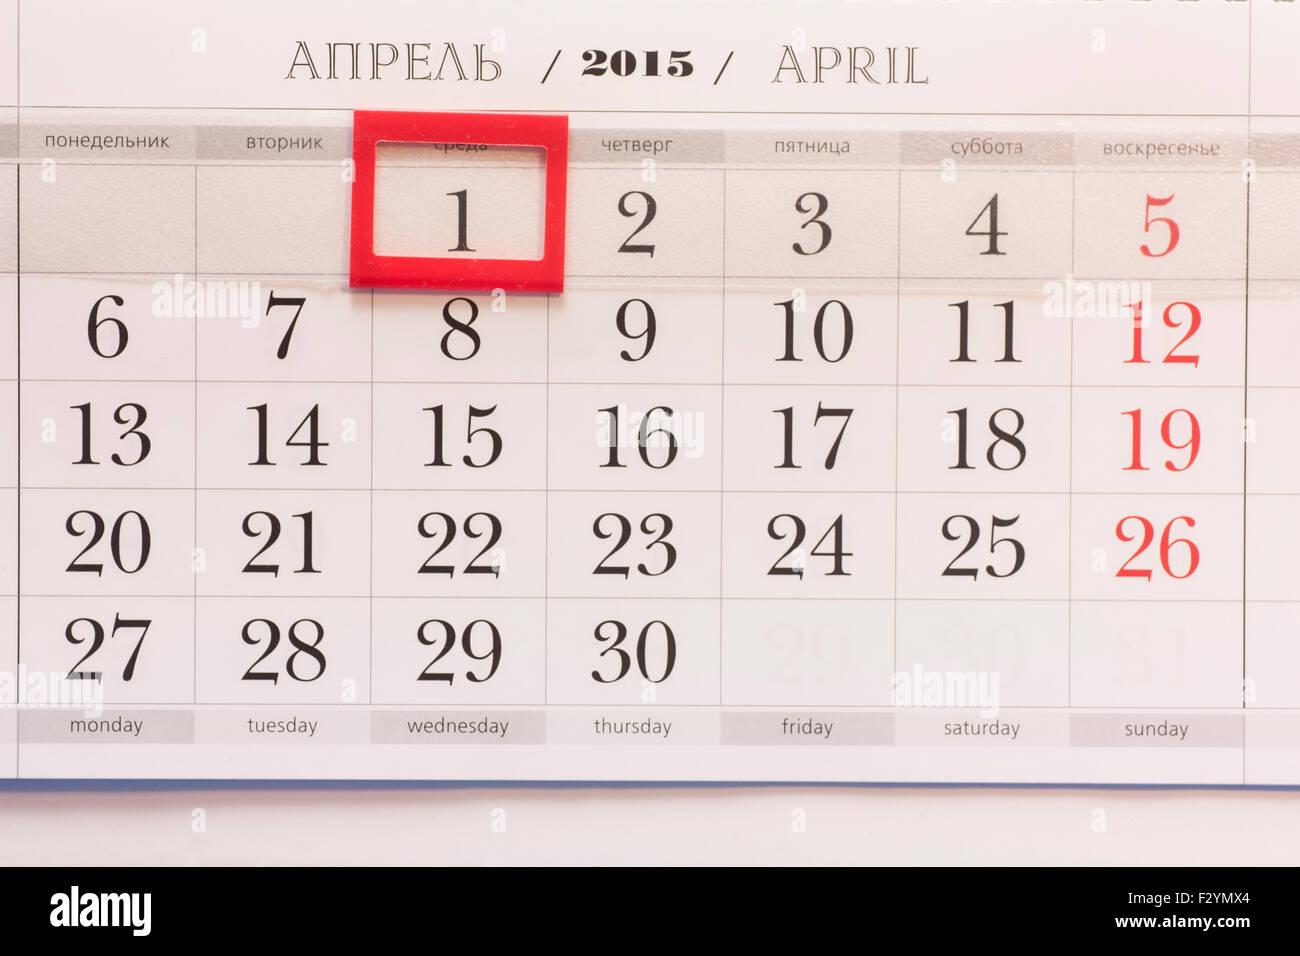 2015 year calendar. April calendar with red mark on framed date 1 ...